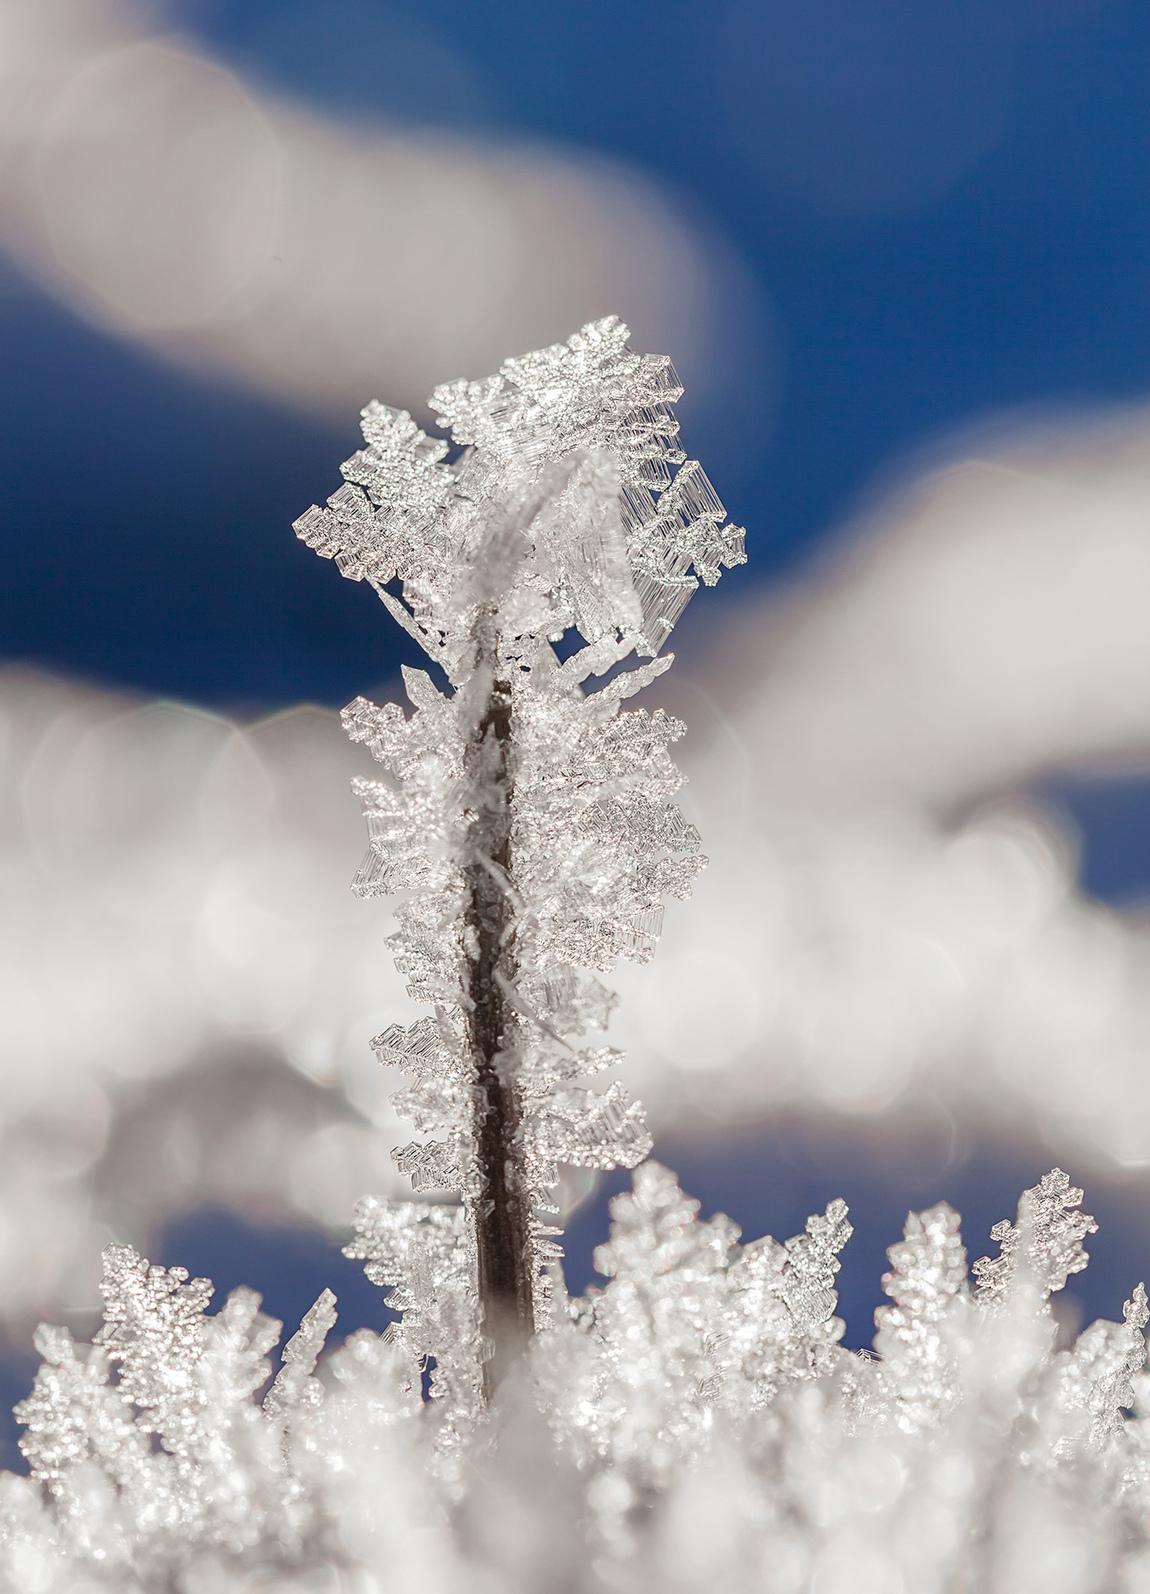 Ylva Wikström - Freeze-up